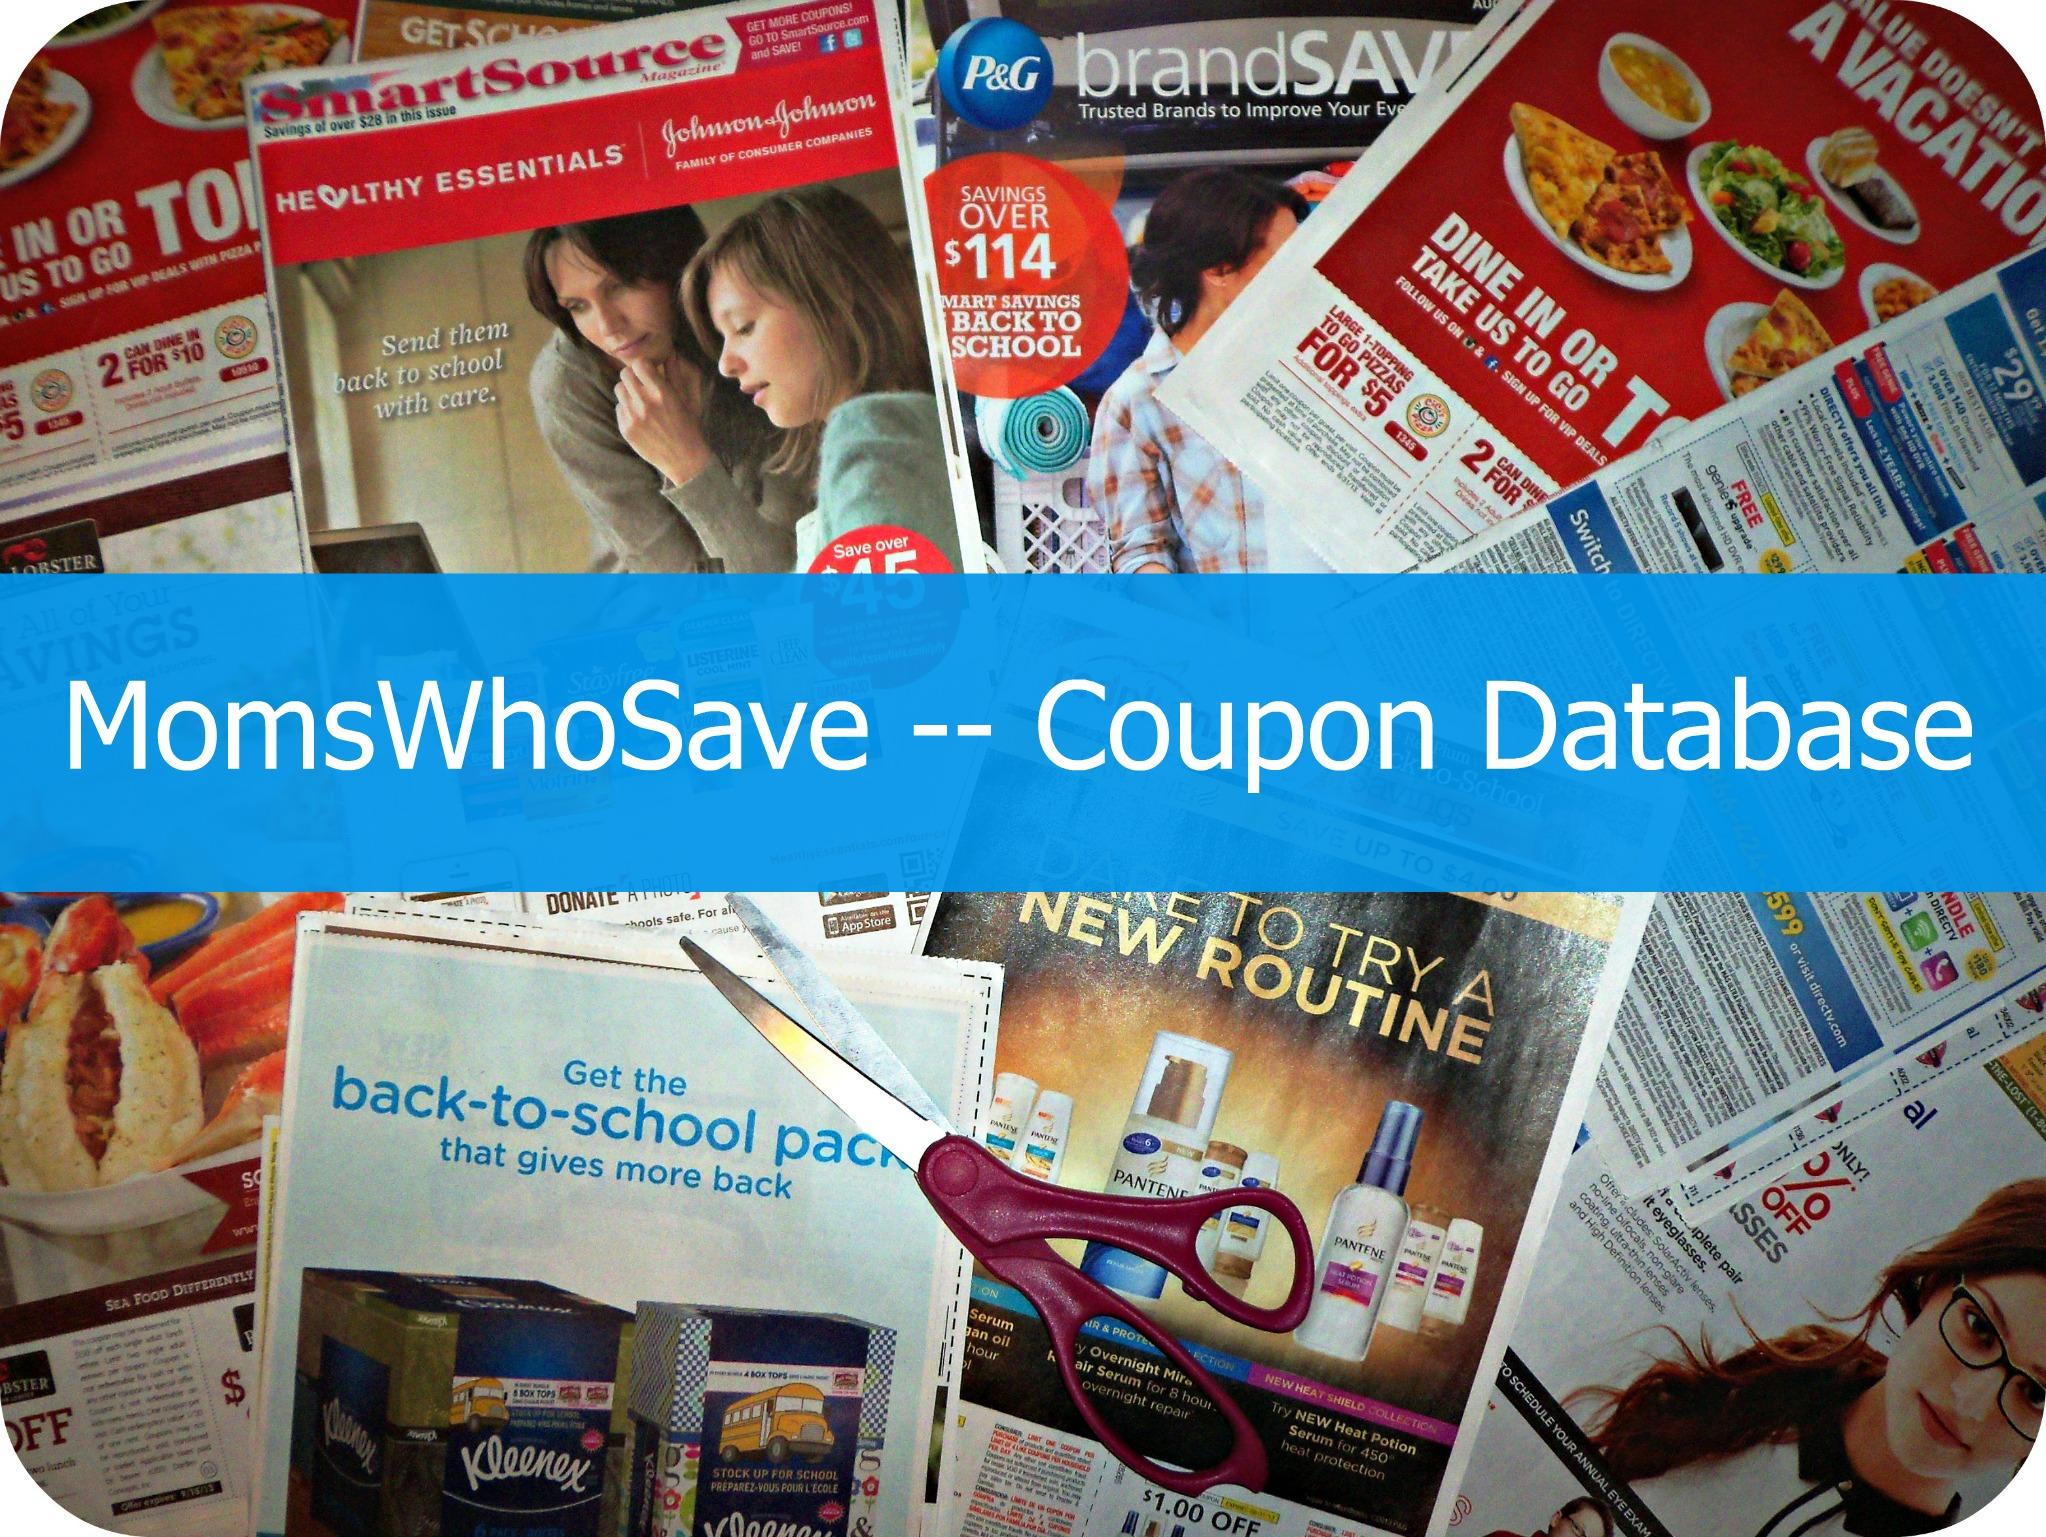 coupon database   MomsWhoSave.com